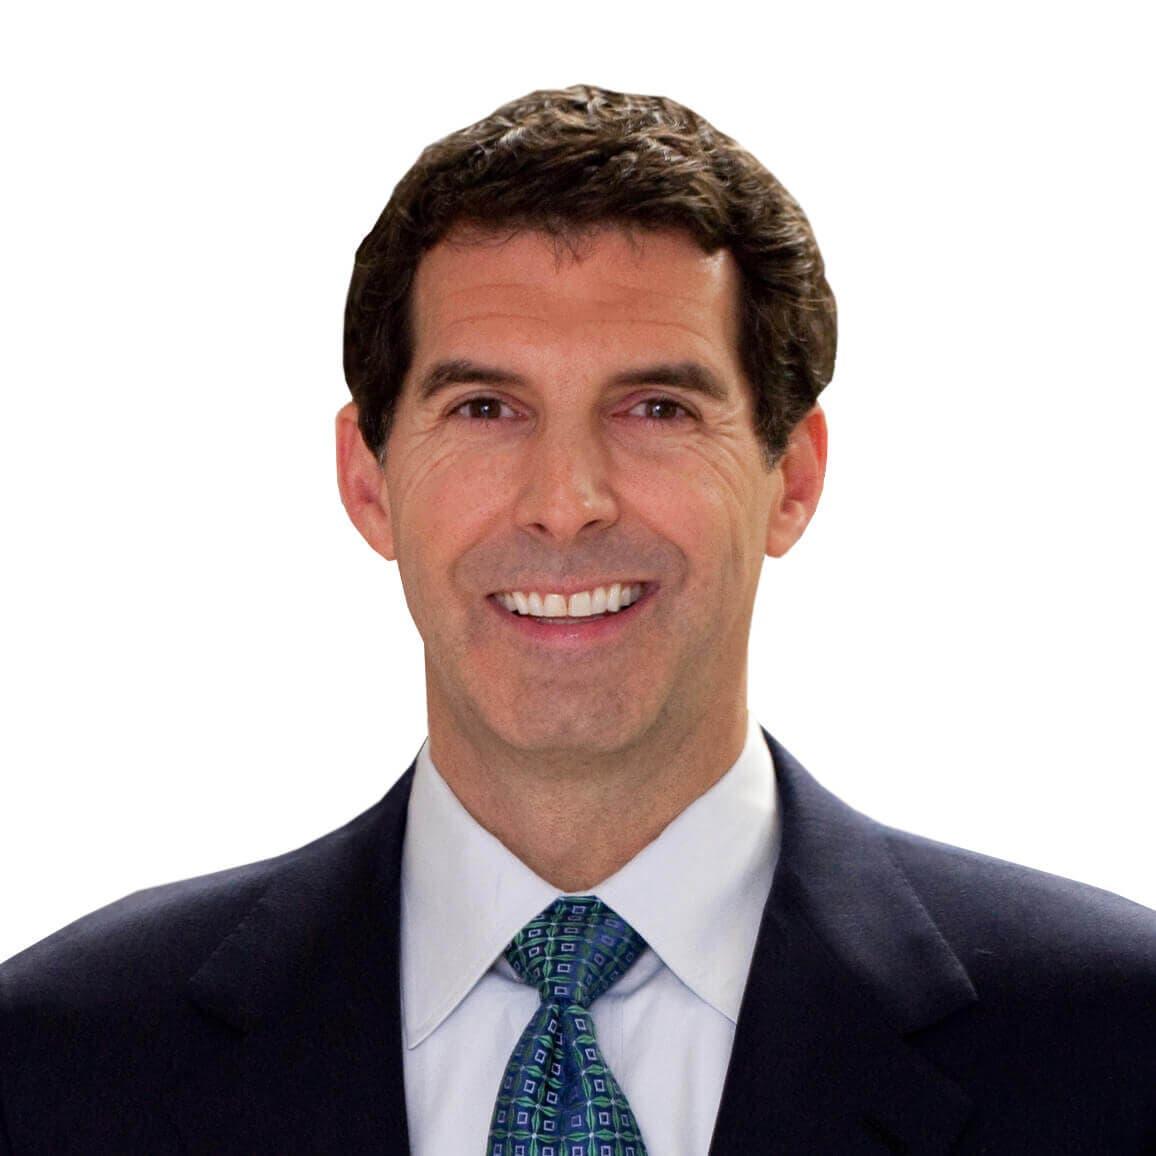 Paul Diaz